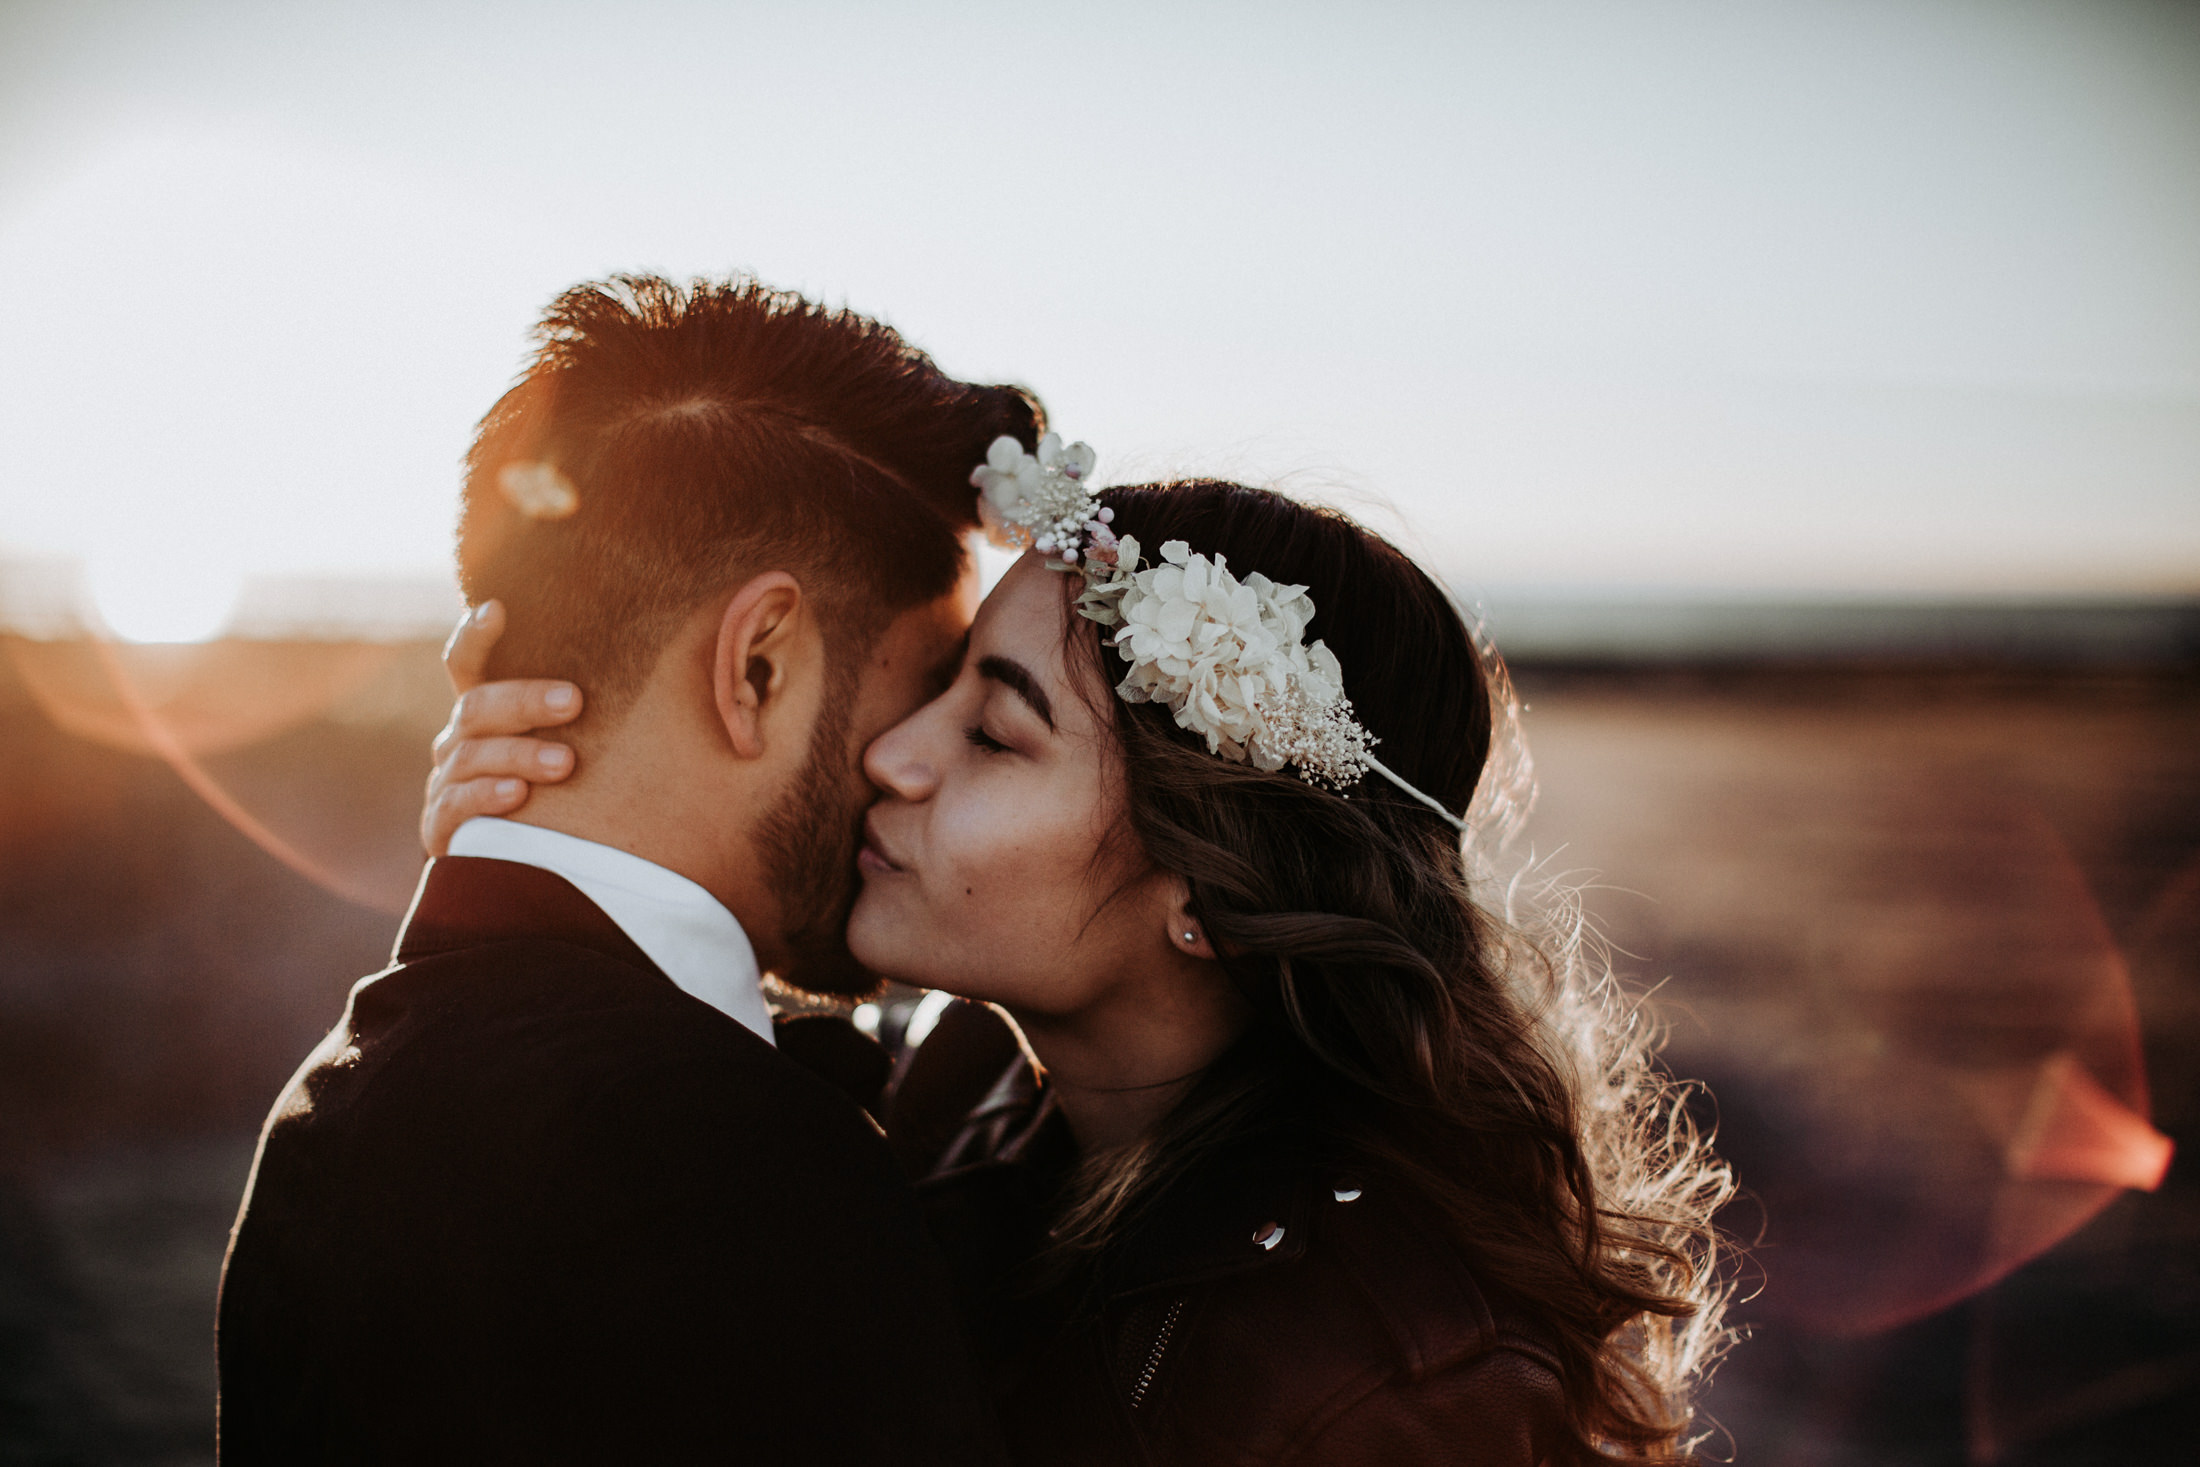 Wedding_Photographer_Mallorca_Daniela-Marquardt_Photography_CanaryIslands_Lanzarote_Iceland_Tuskany_Santorini_Portugal_Schweiz_Austria_Bayern_Elopement_Hochzeitsfotograf_Norddeichich_22